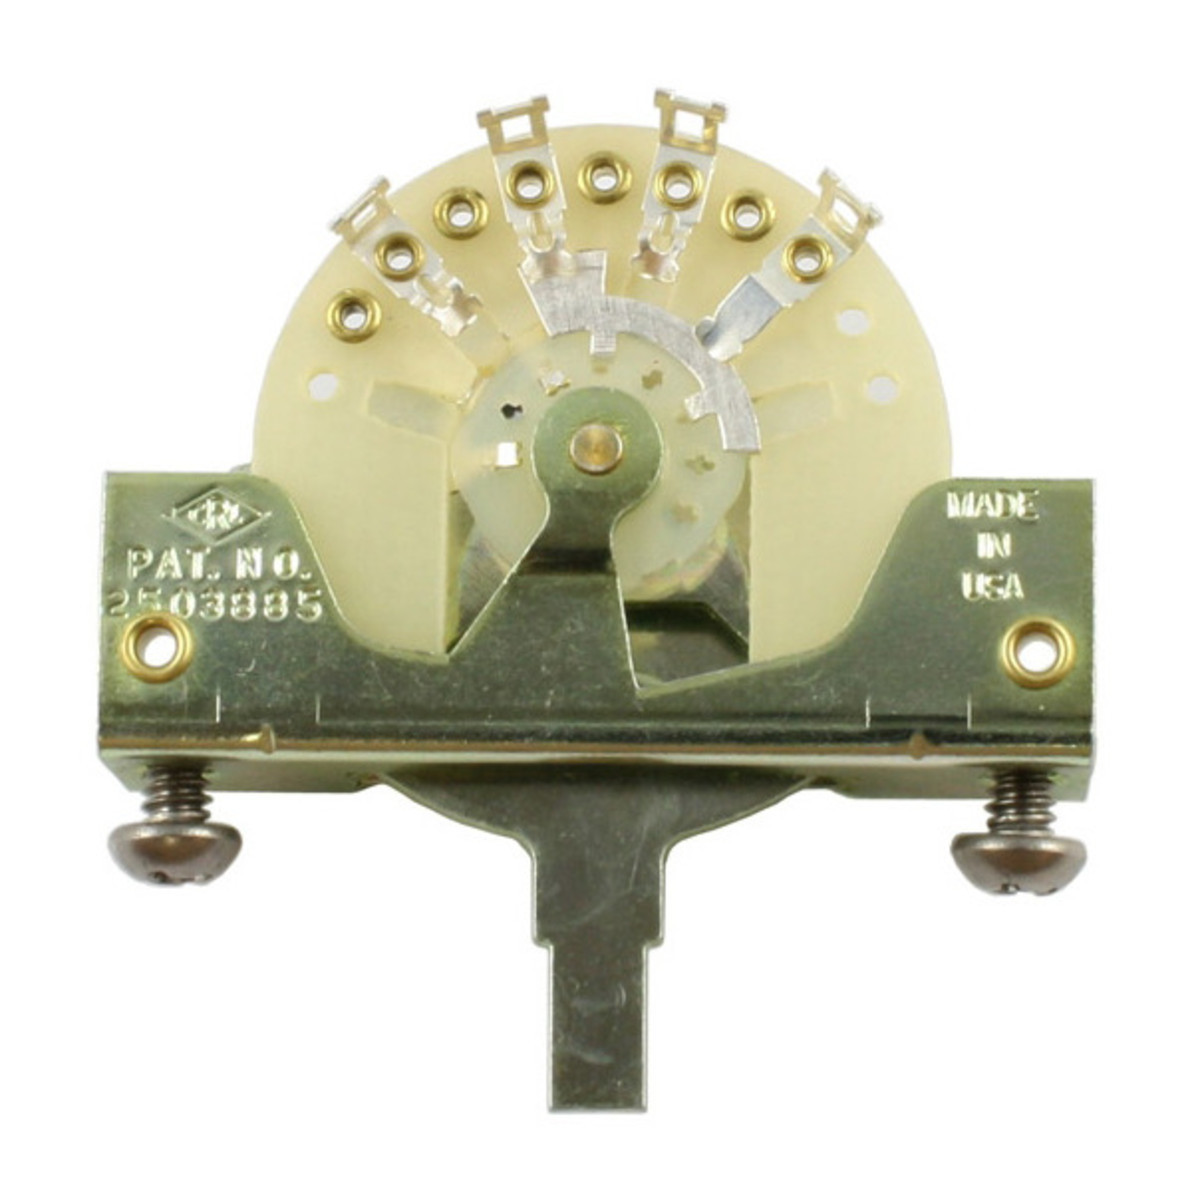 Original CRL 3-Way Blade Switch